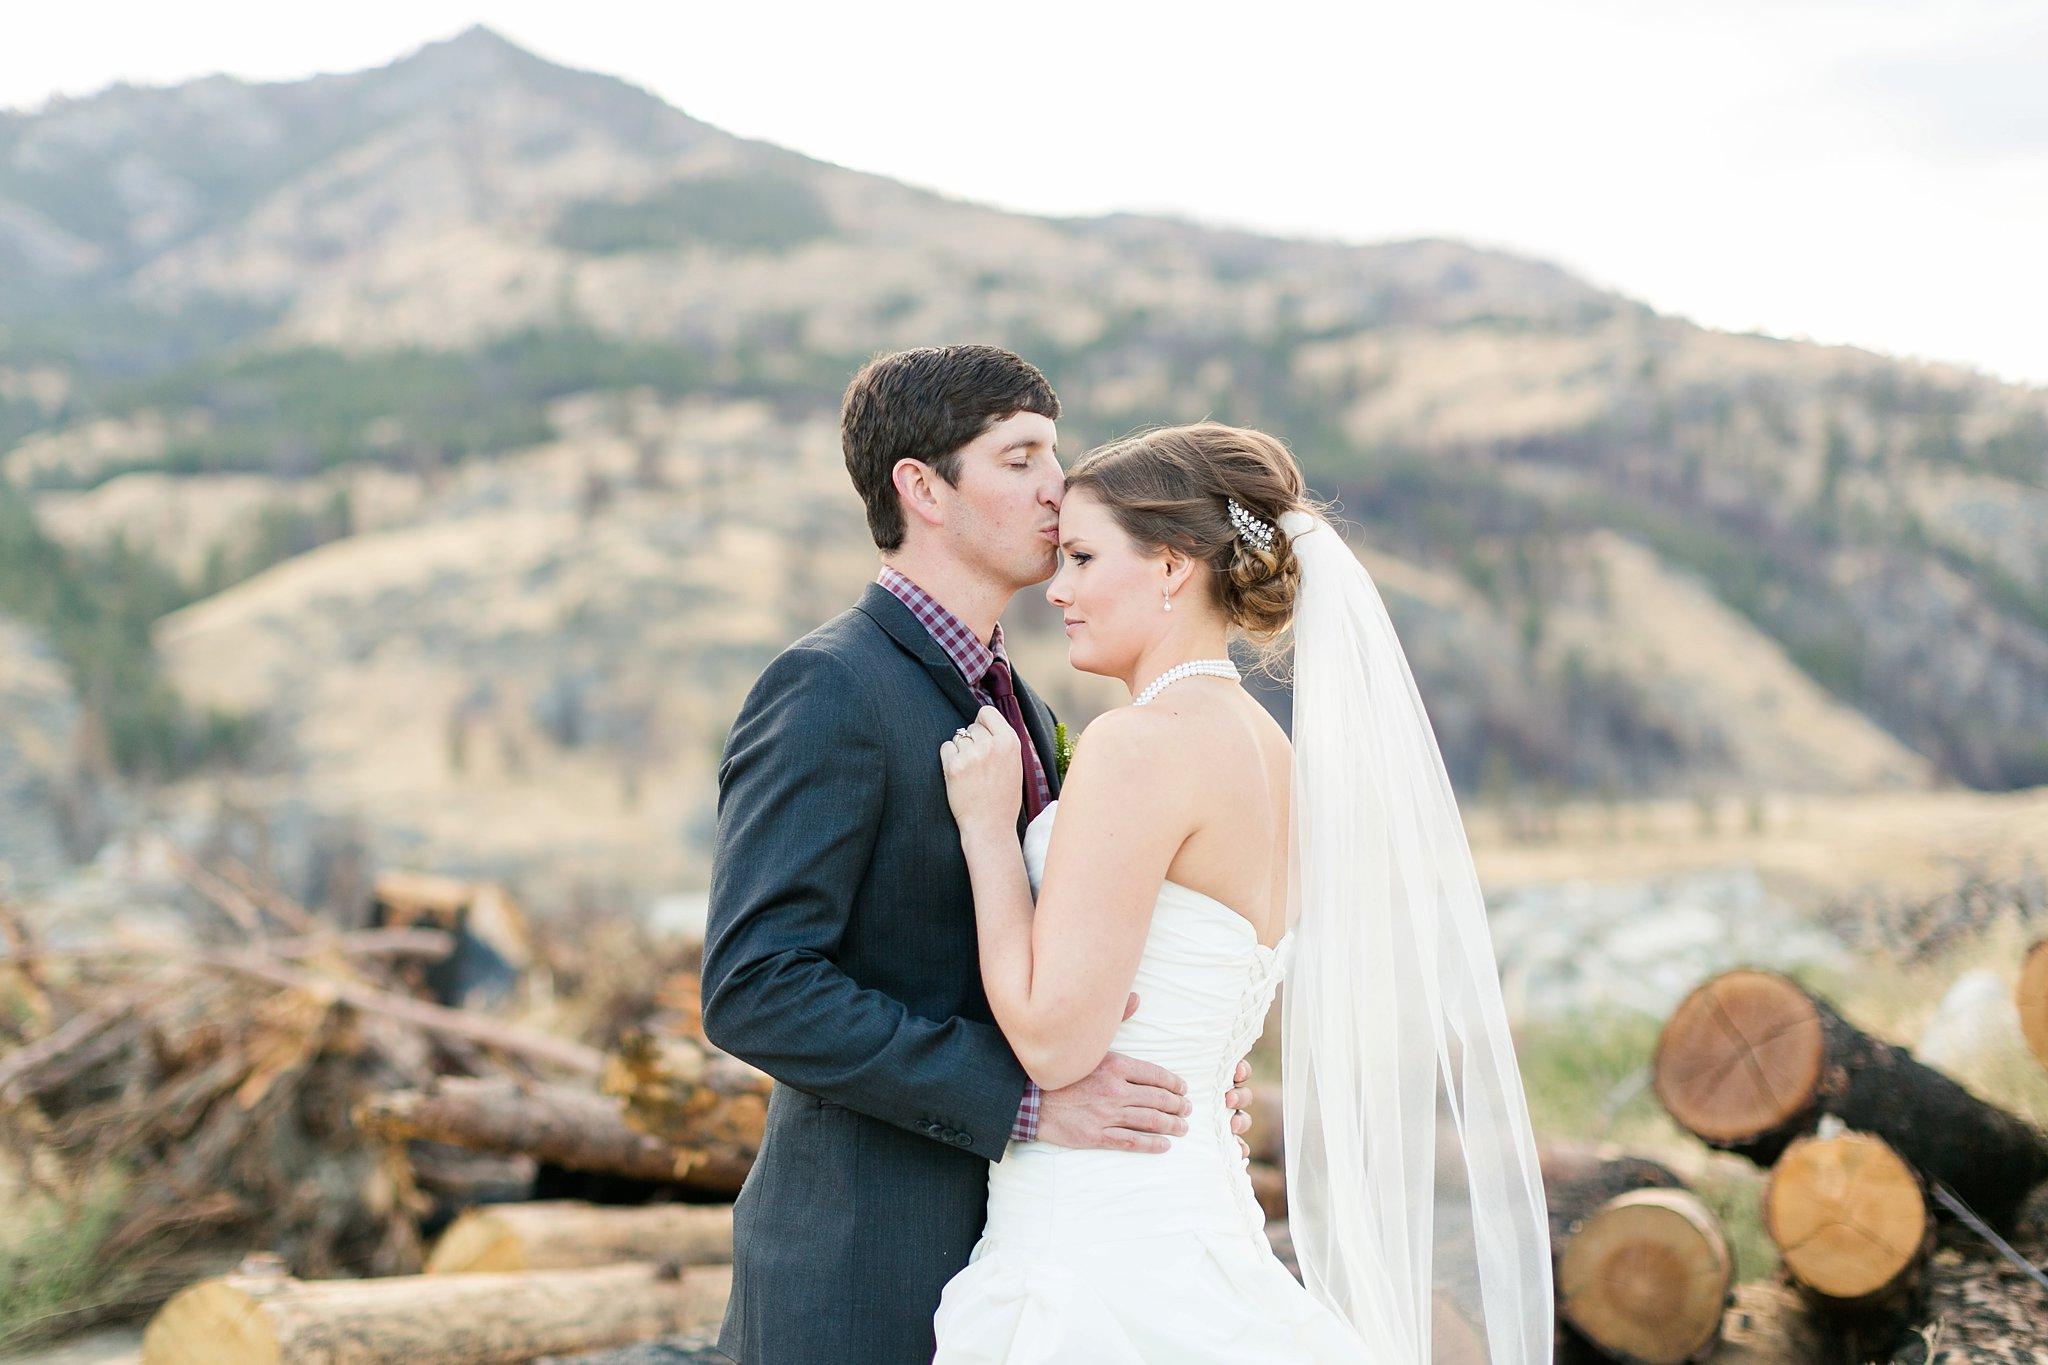 Chelan Washington Wedding Photos Megan Kelsey Photography Delight Wedding Workshop Styled Shoot Annalee & Scot-157.jpg